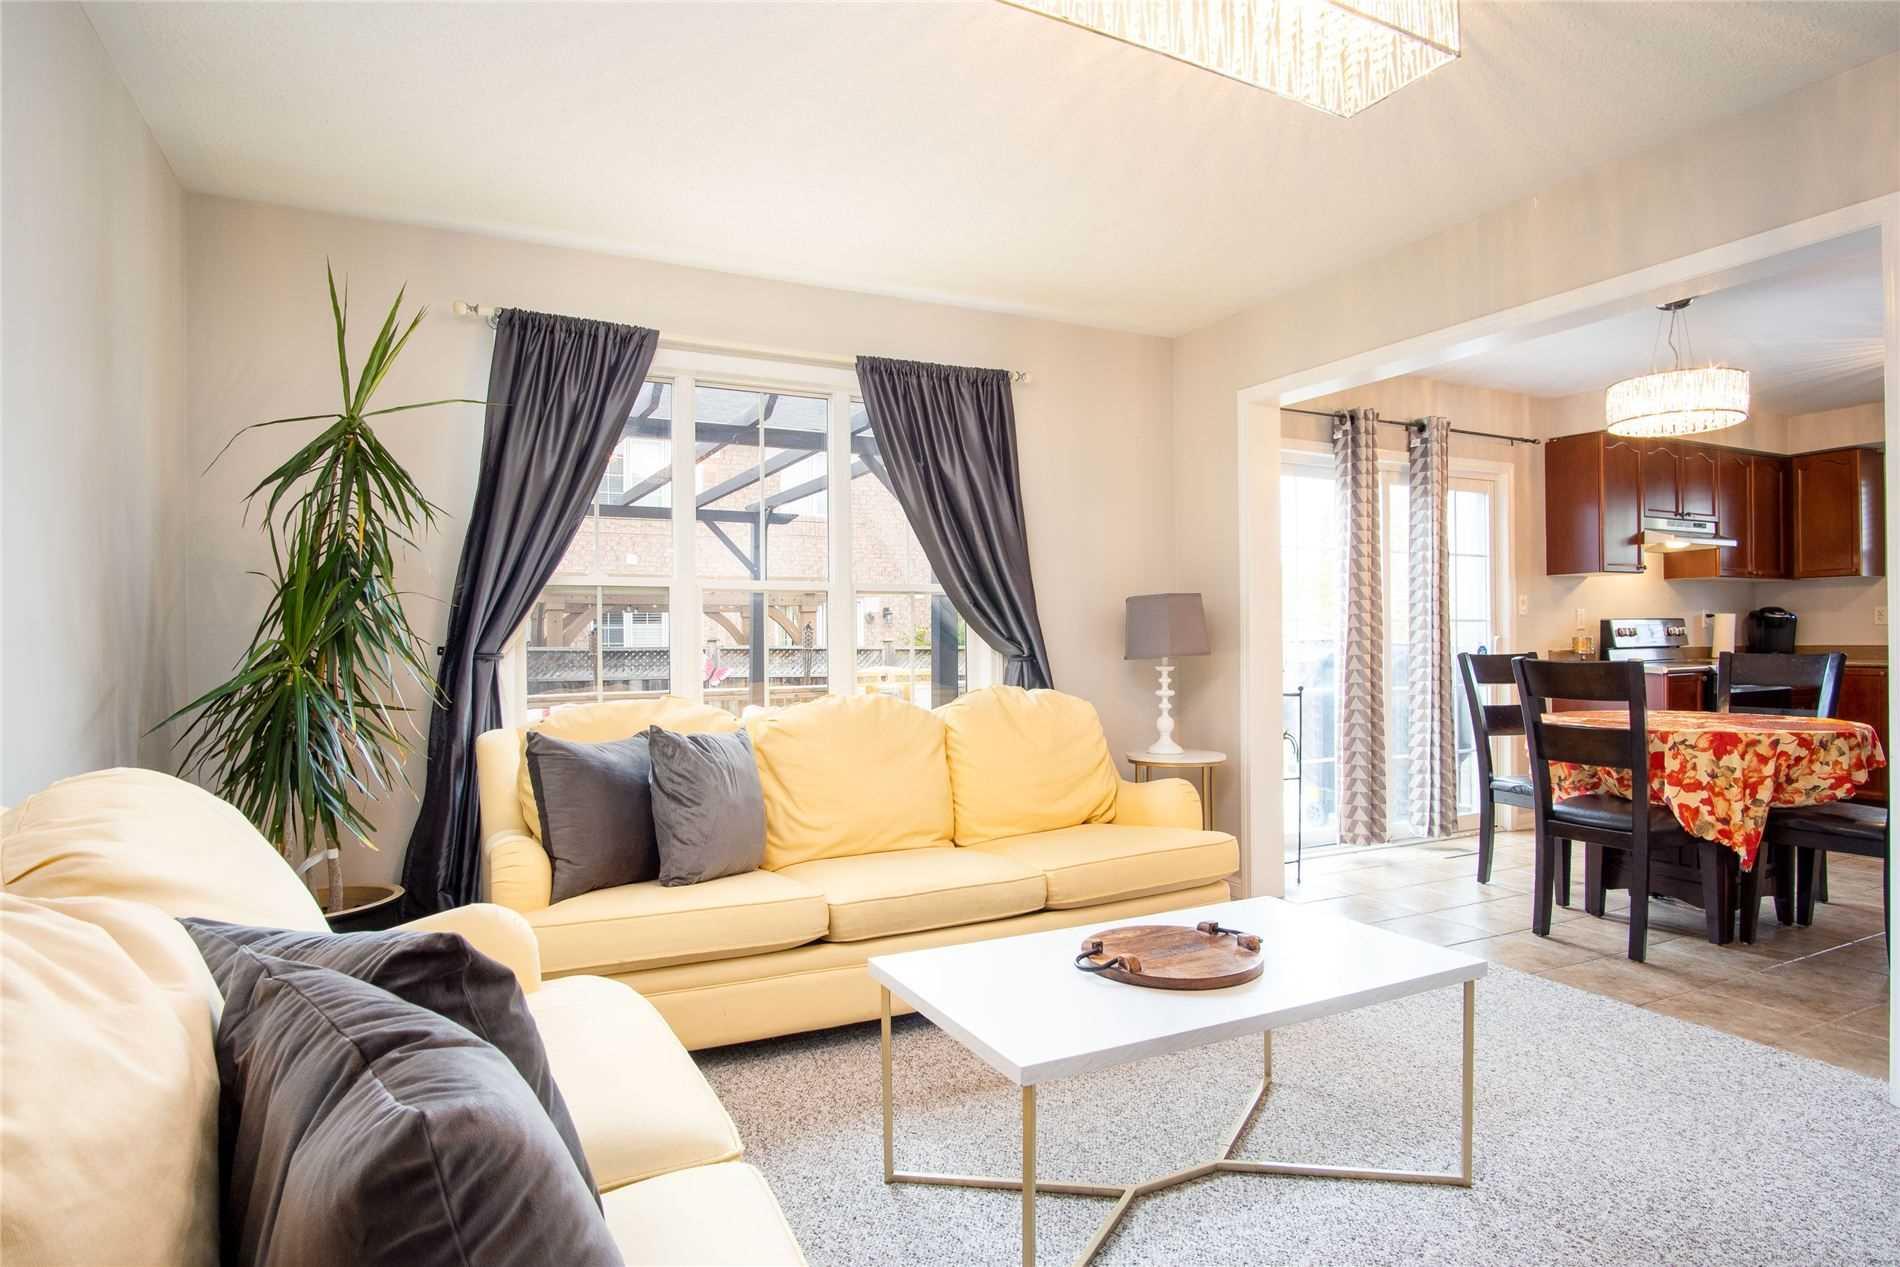 827 Biggar Hts - Coates Detached for sale, 4 Bedrooms (W5400280) - #14